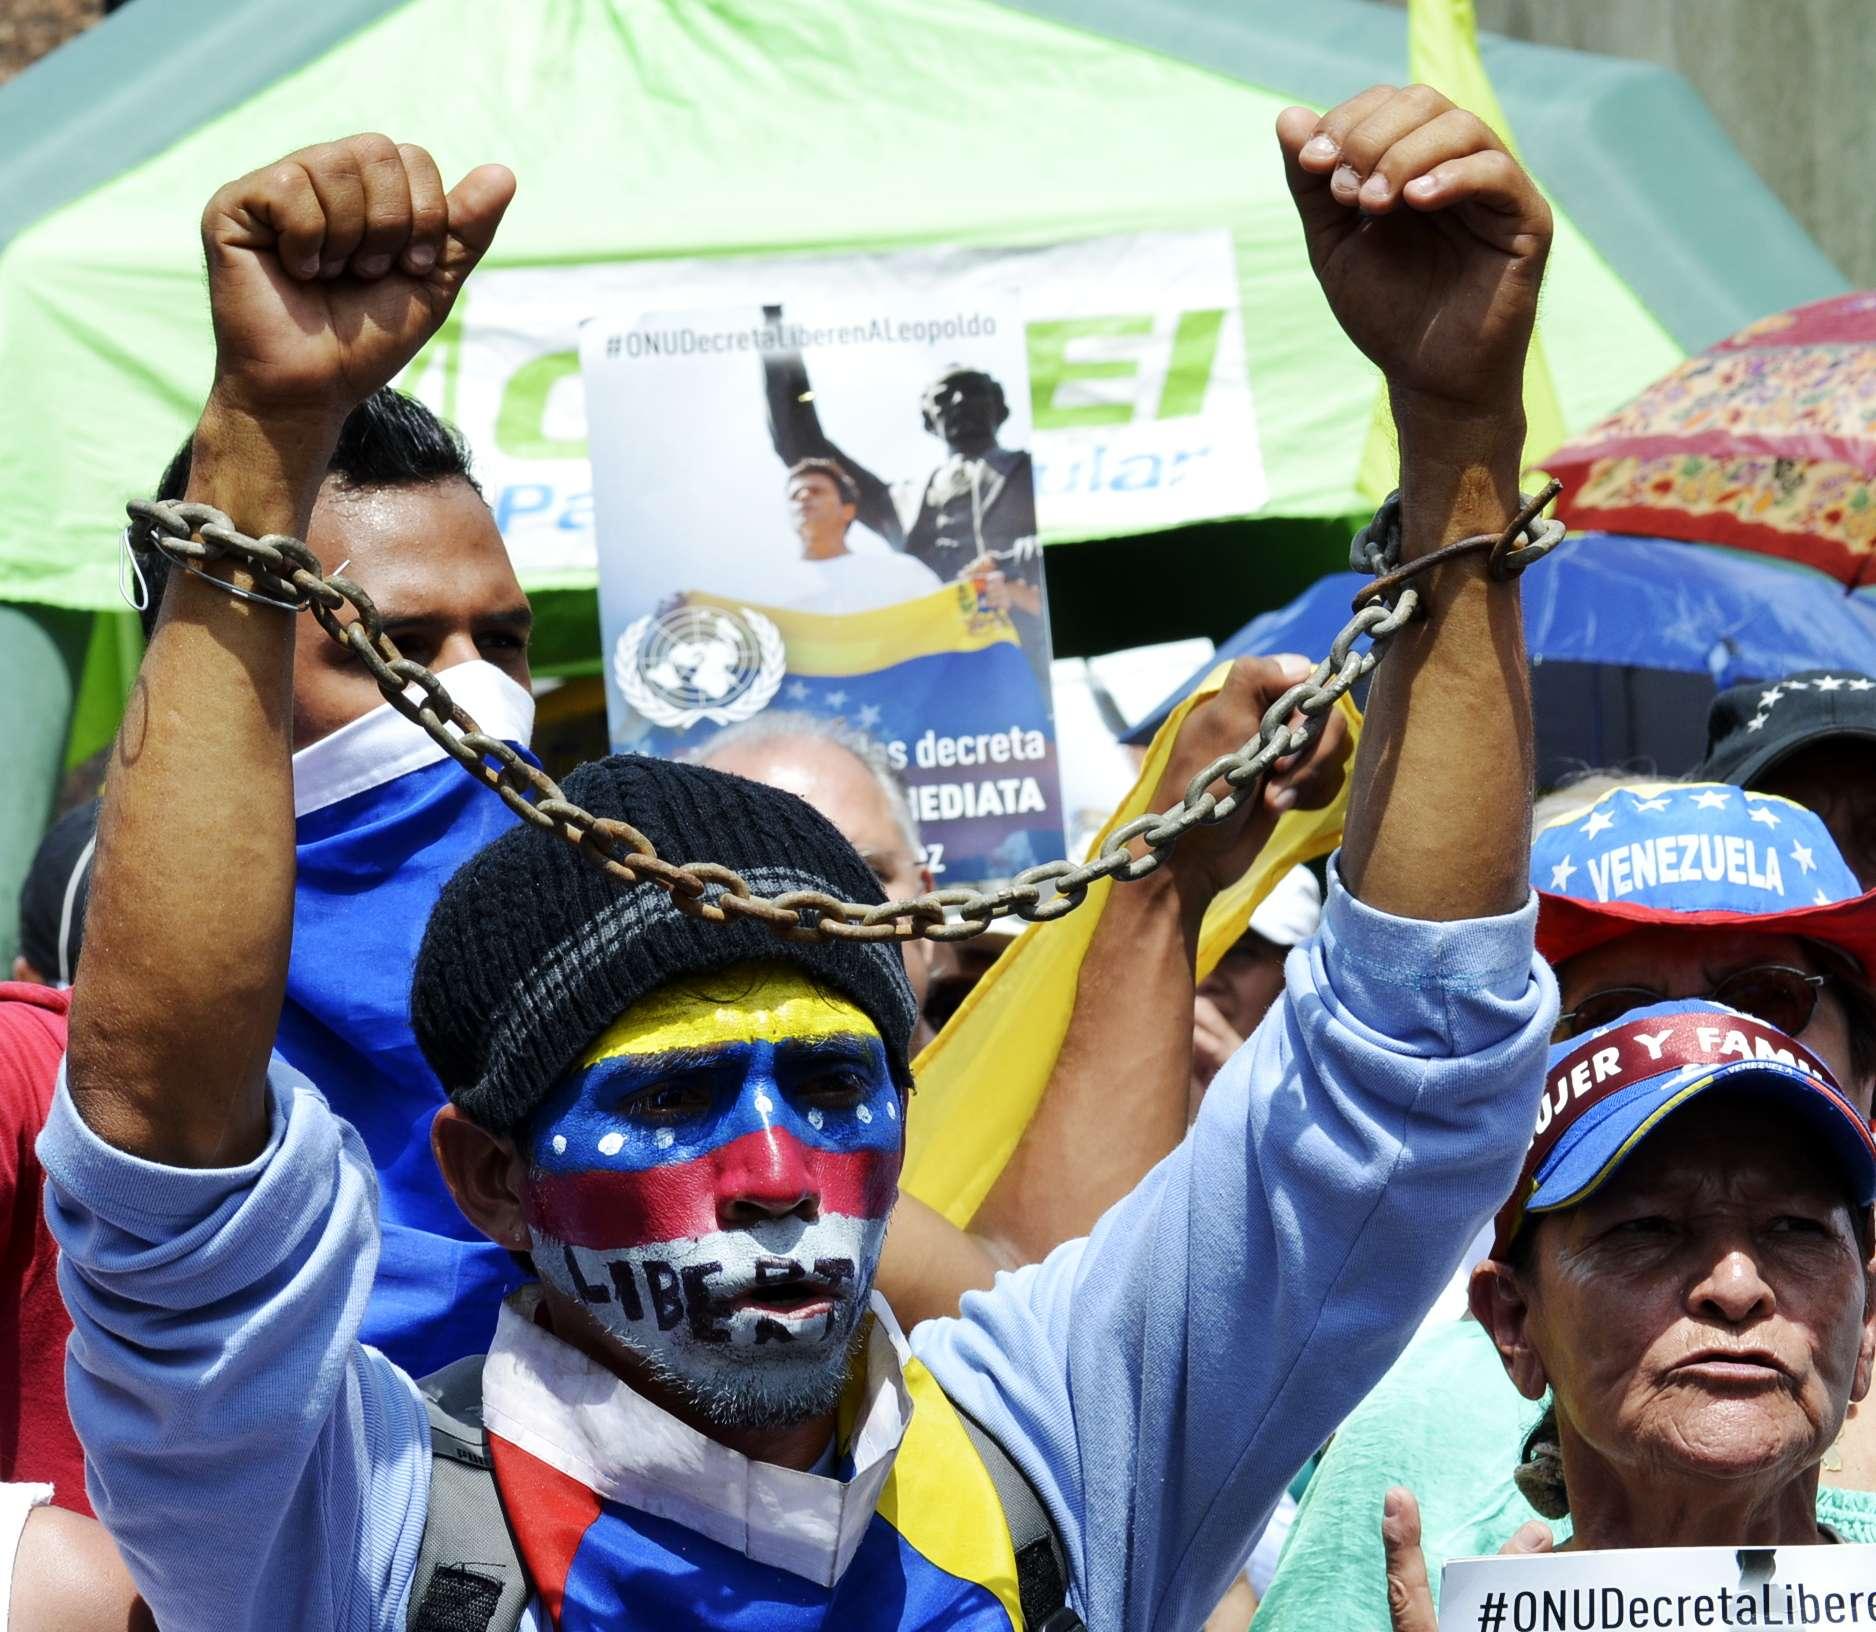 Reality has an anti-Chavista bias.